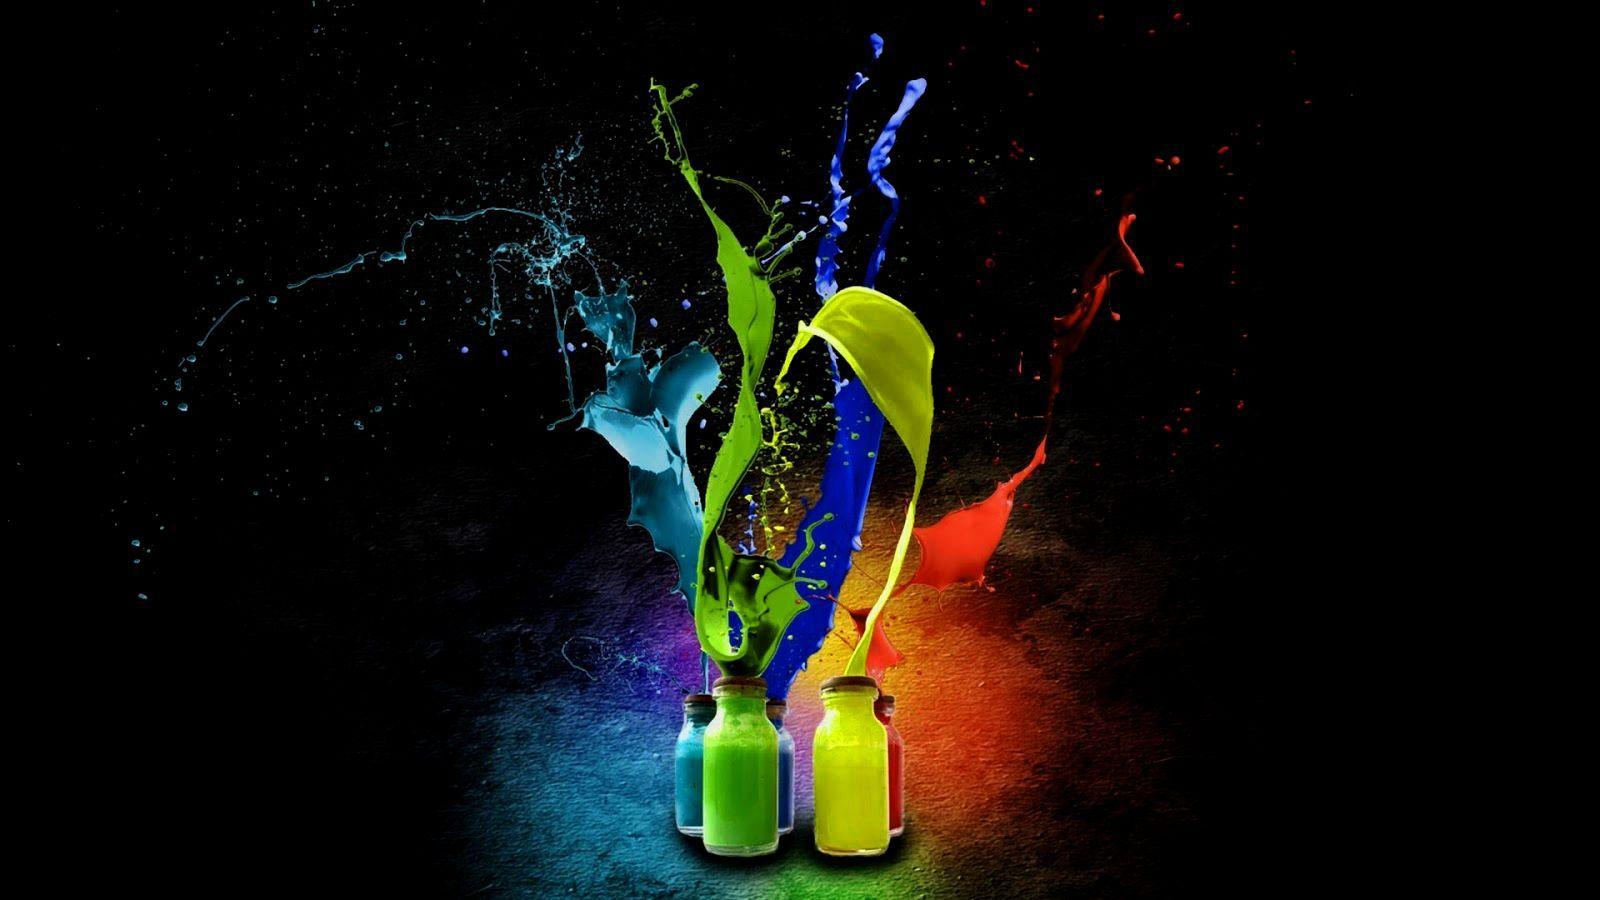 Life In Full Colour - 1600x900 - Download HD Wallpaper - WallpaperTip